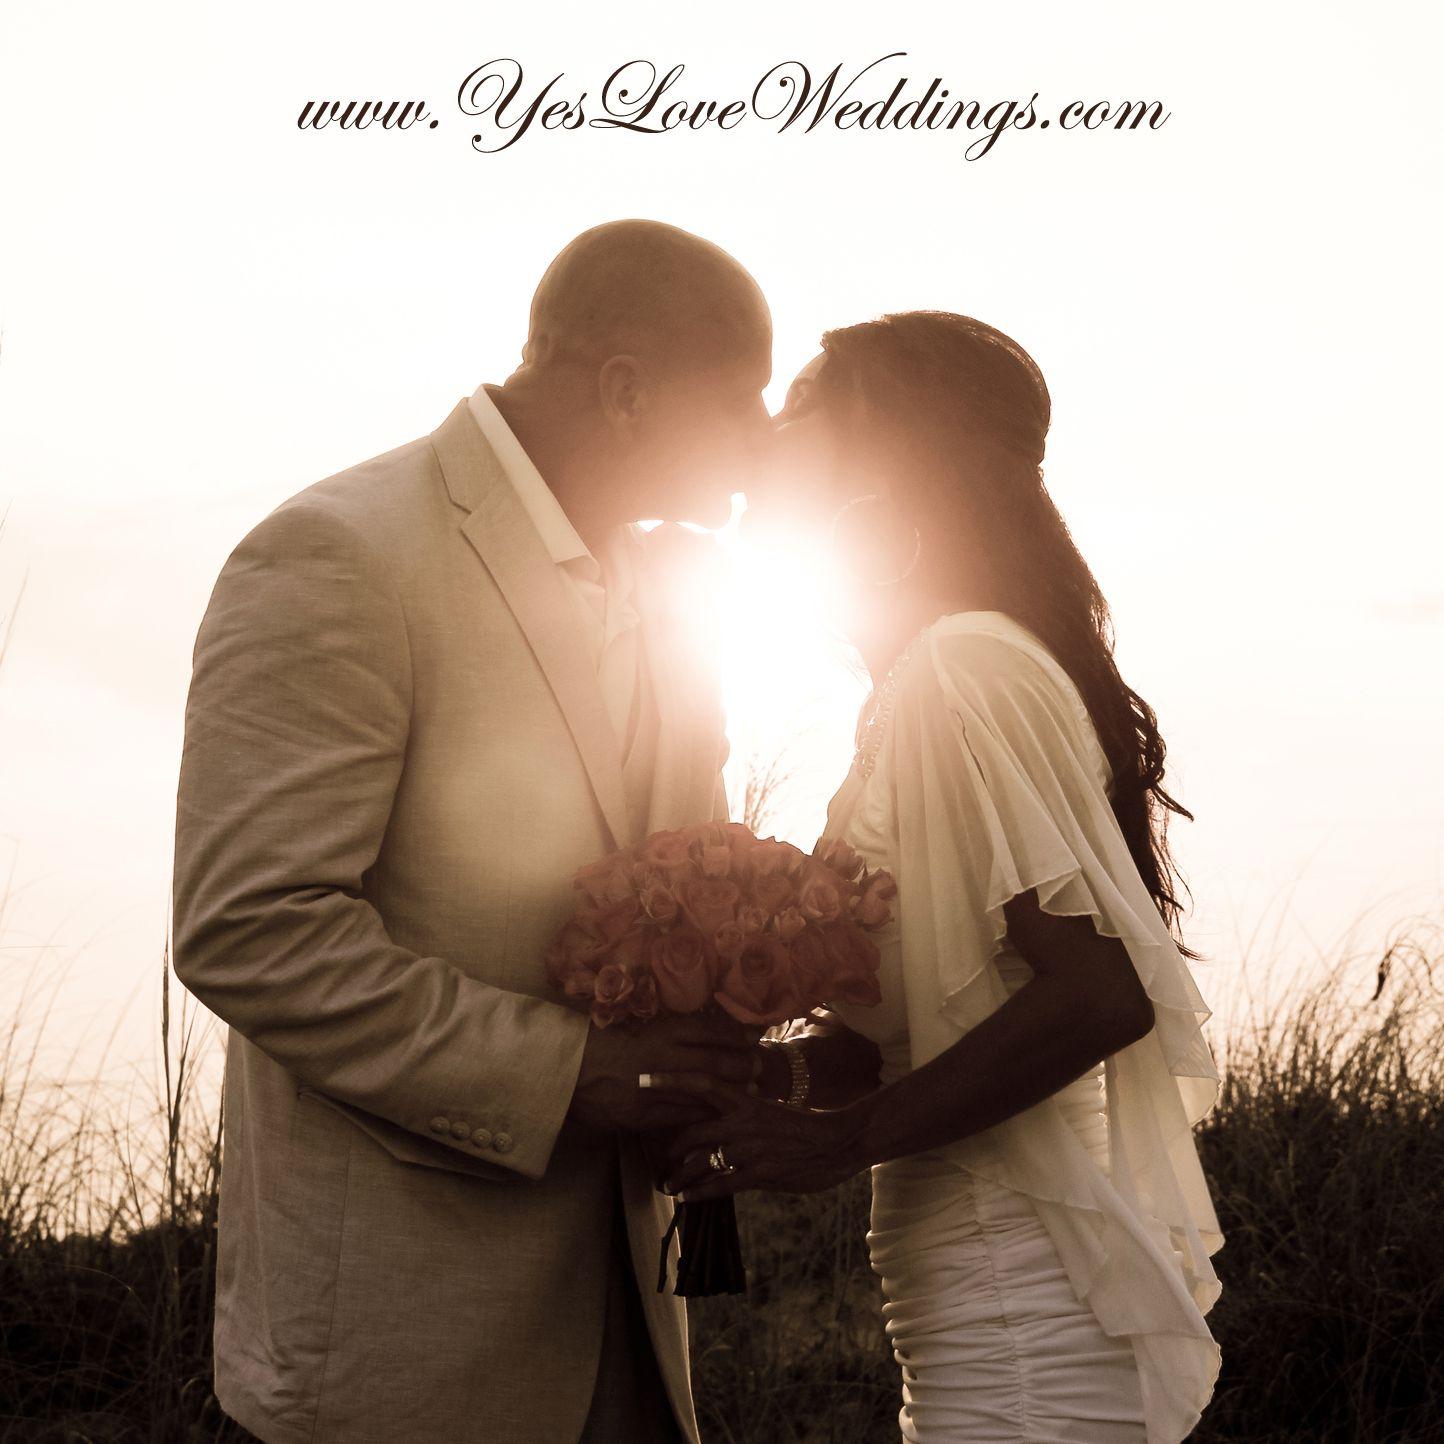 Beach Wedding Weddings Elopements Savannah Ga Hiltonhead Weddingphotography Tybeeisland